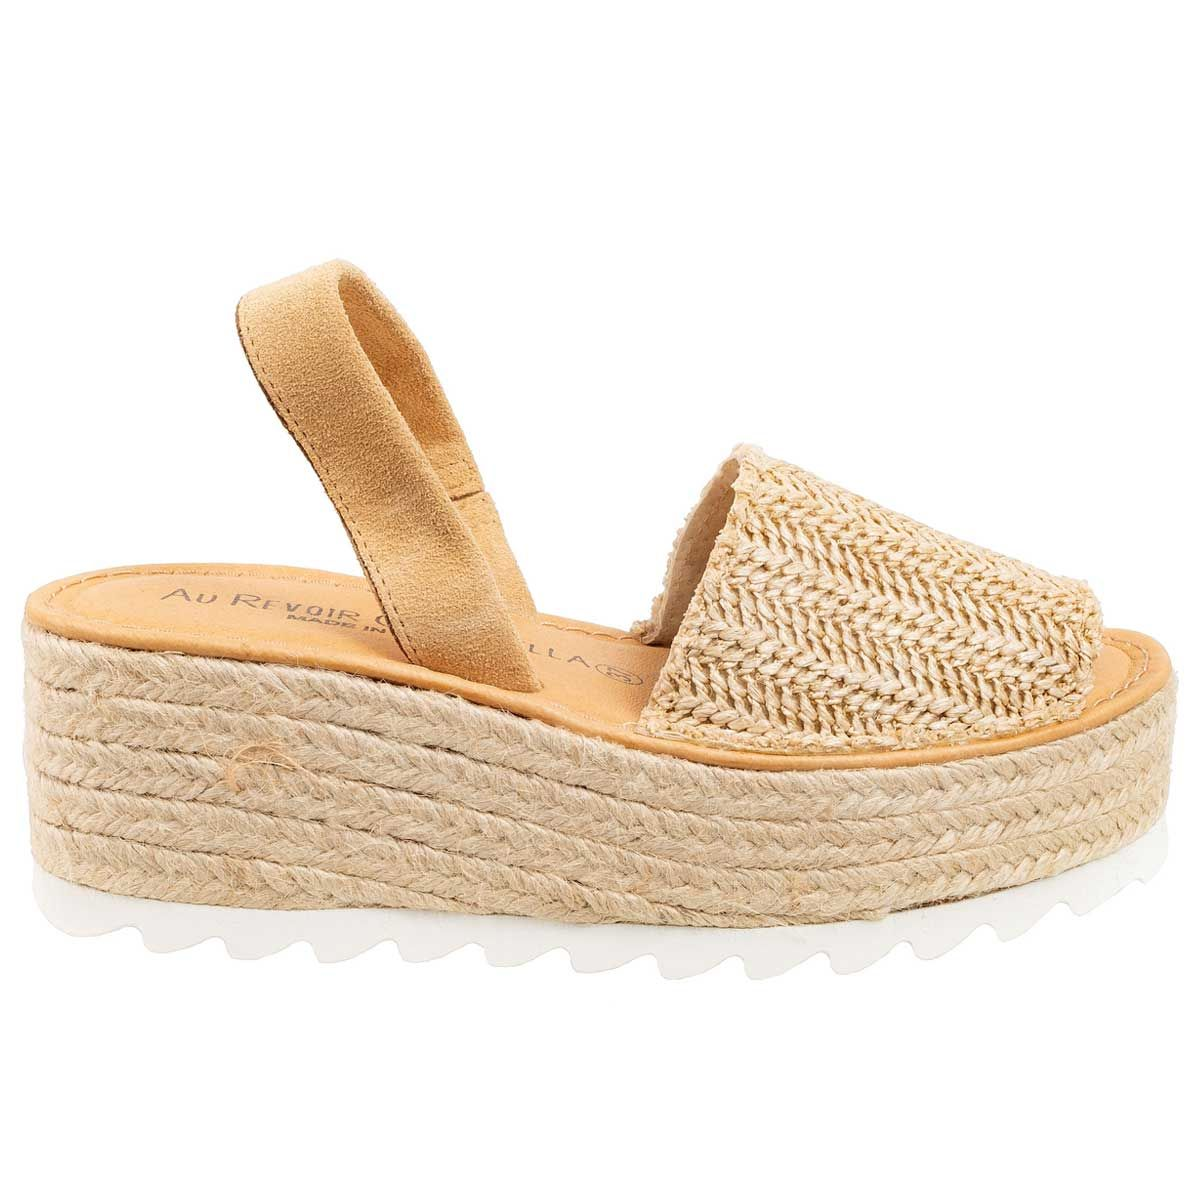 Leindia Sparto Platform Sandal in Brown